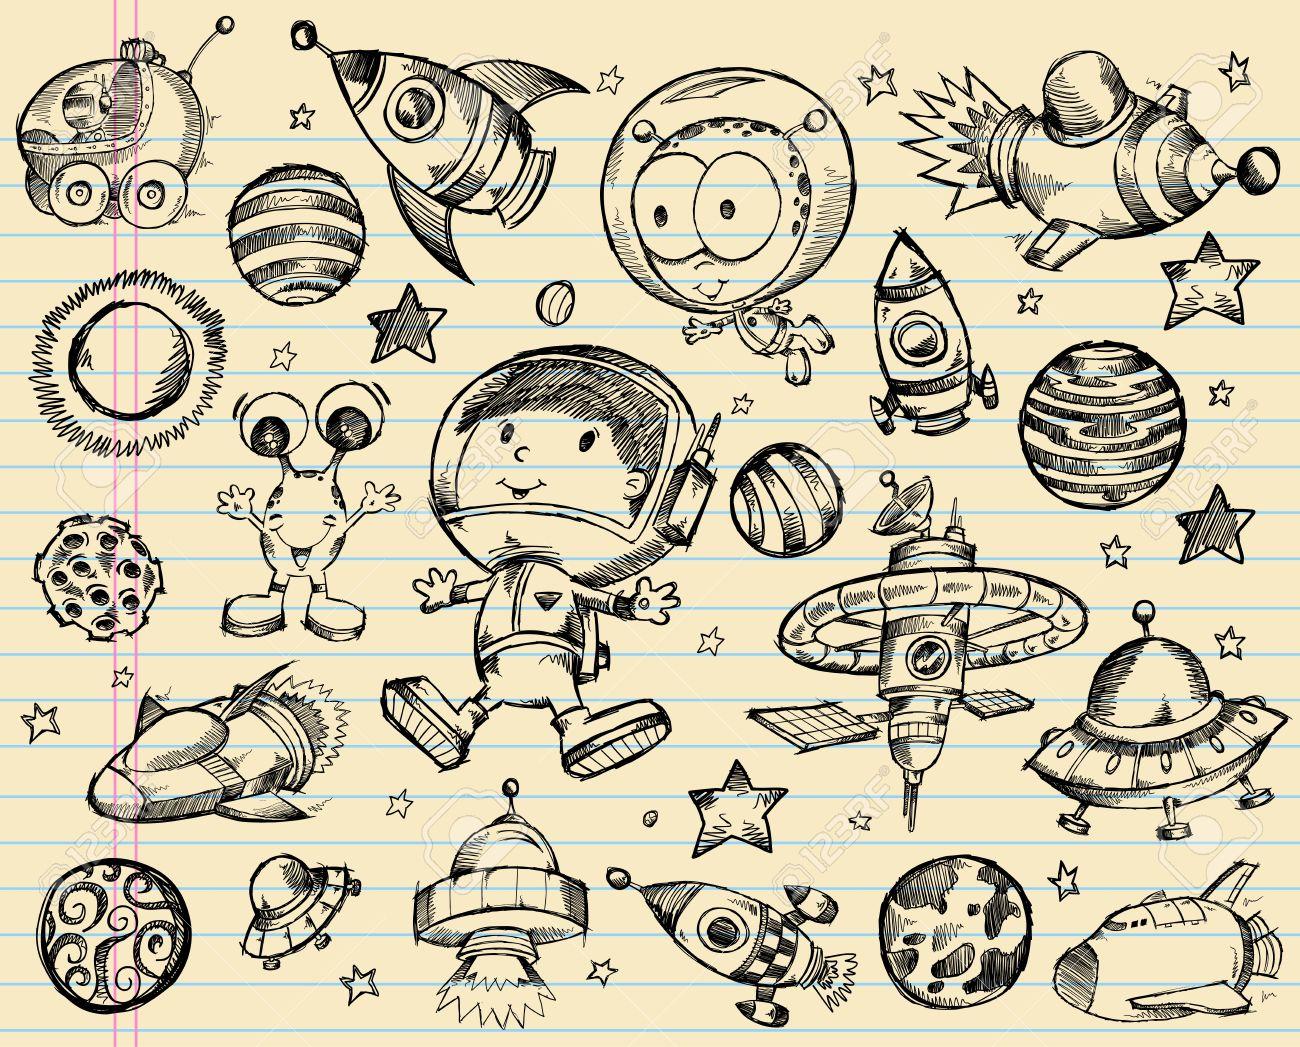 Outer Space Doodle Sketch Illustration Set Stock Vector - 15122223